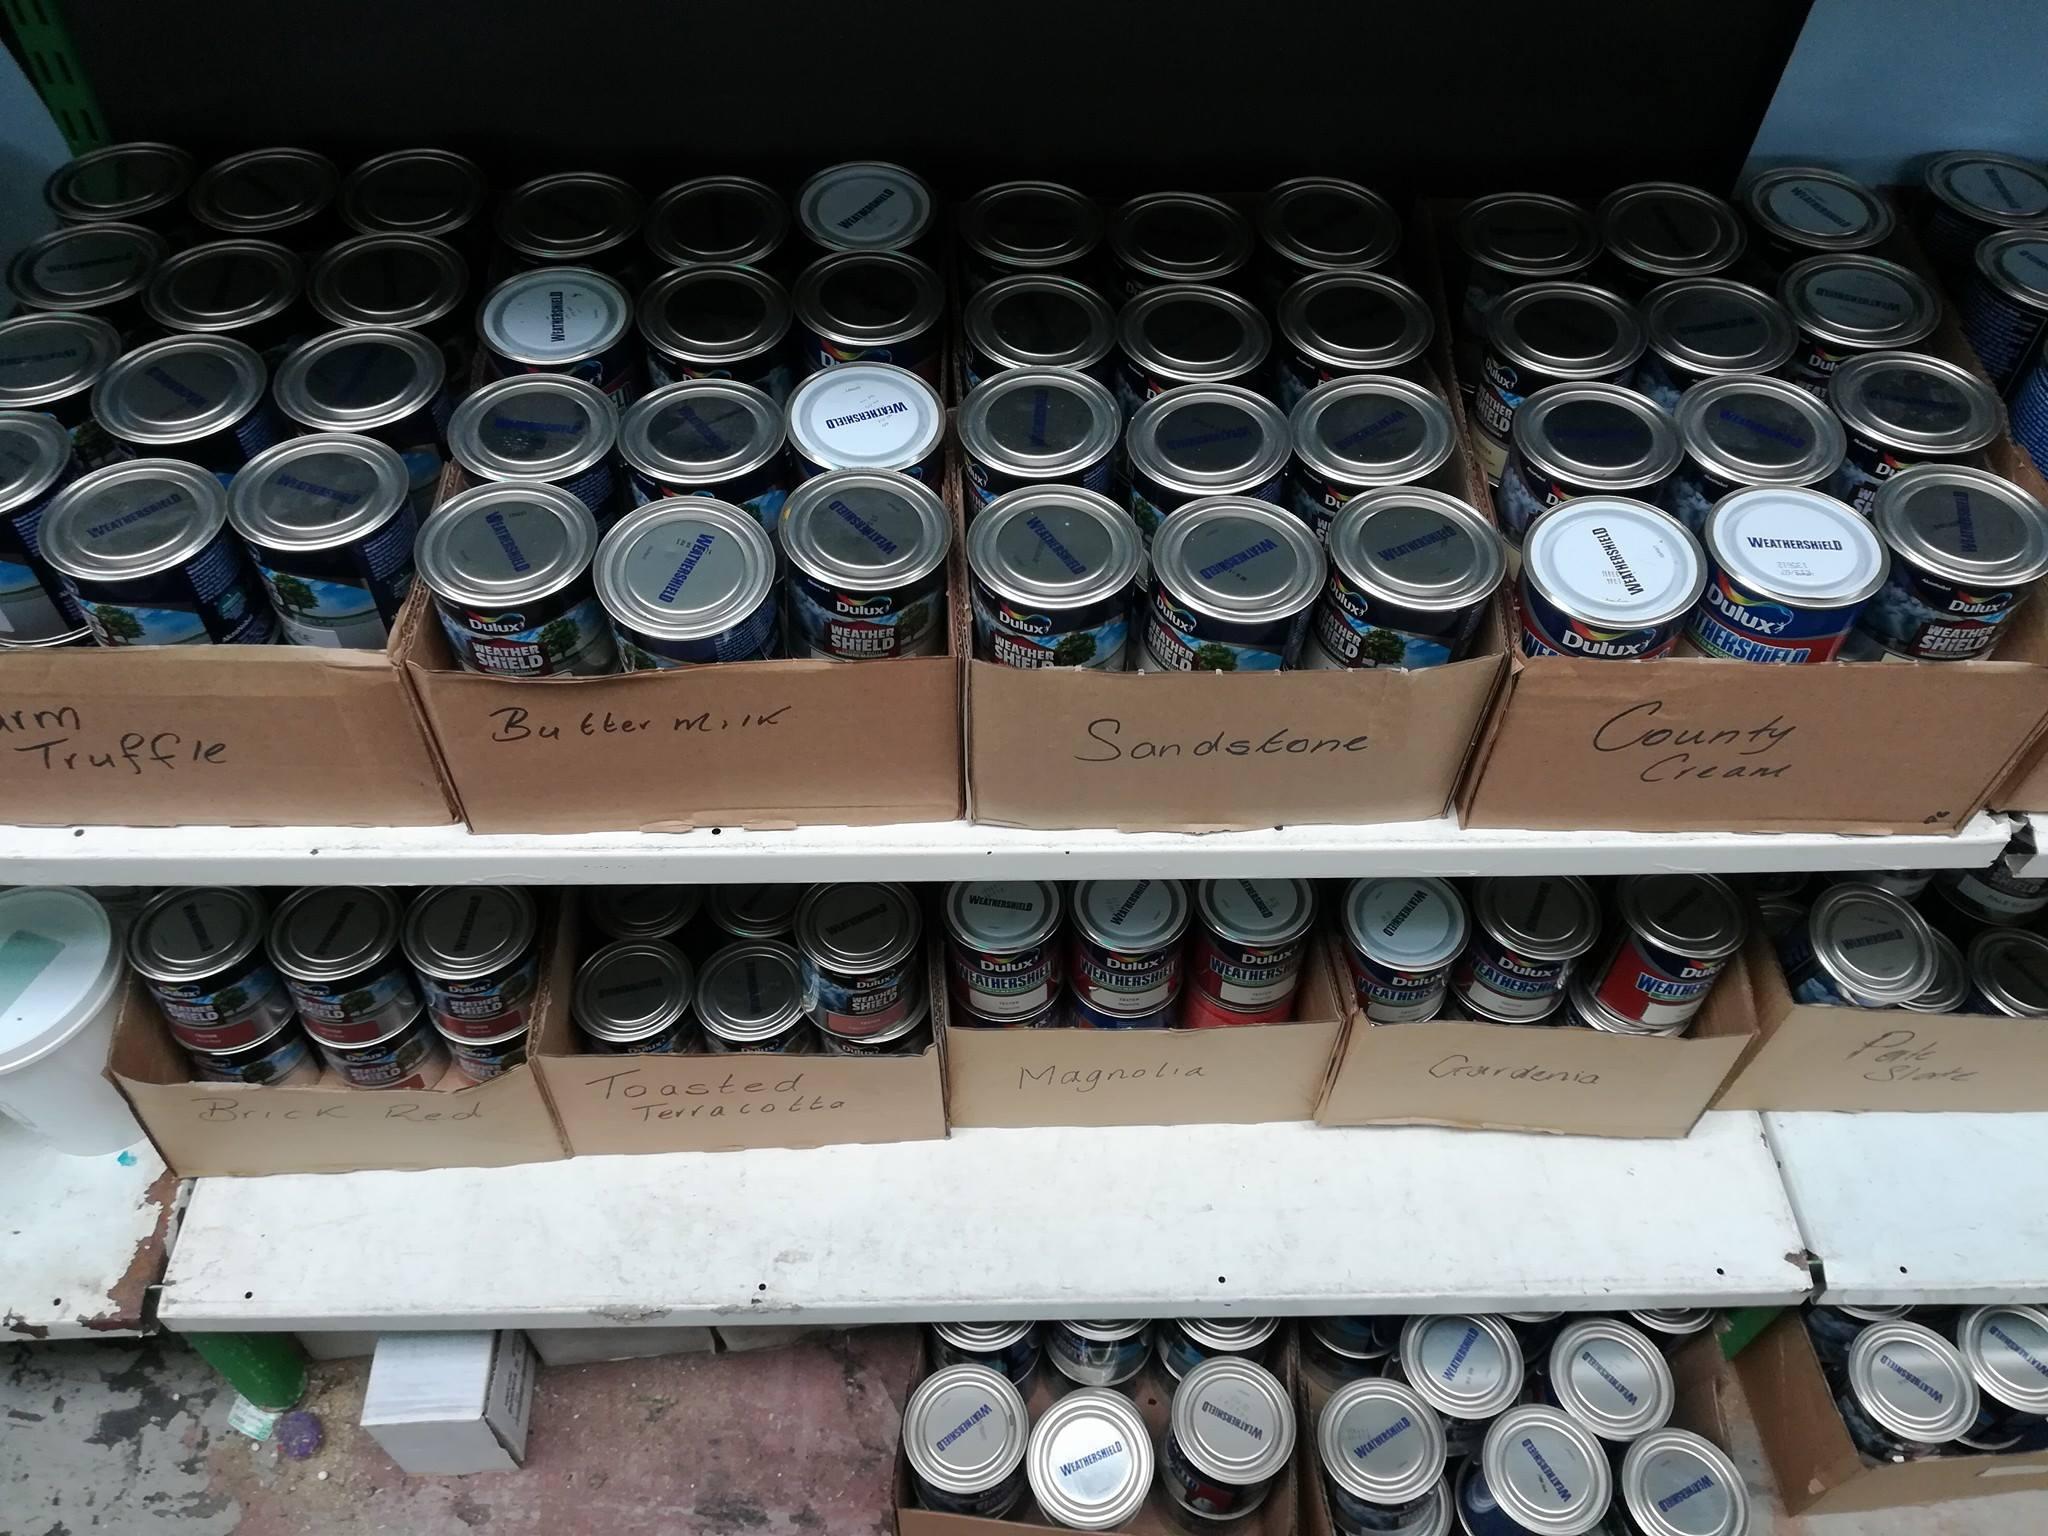 Boxes full of masonry paint